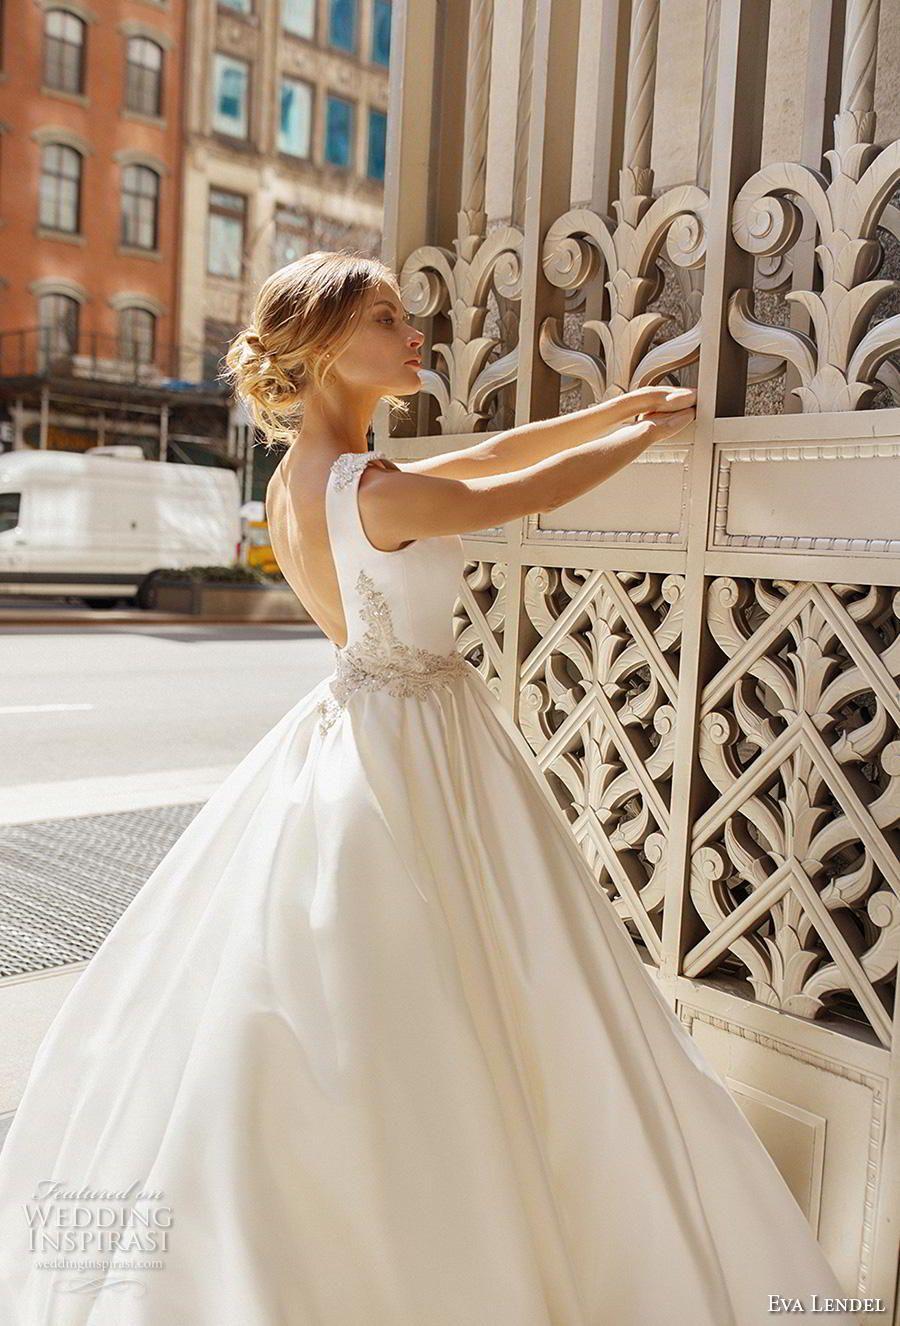 Eva lendel wedding dresses u ucsunriseud bridal collection Đám